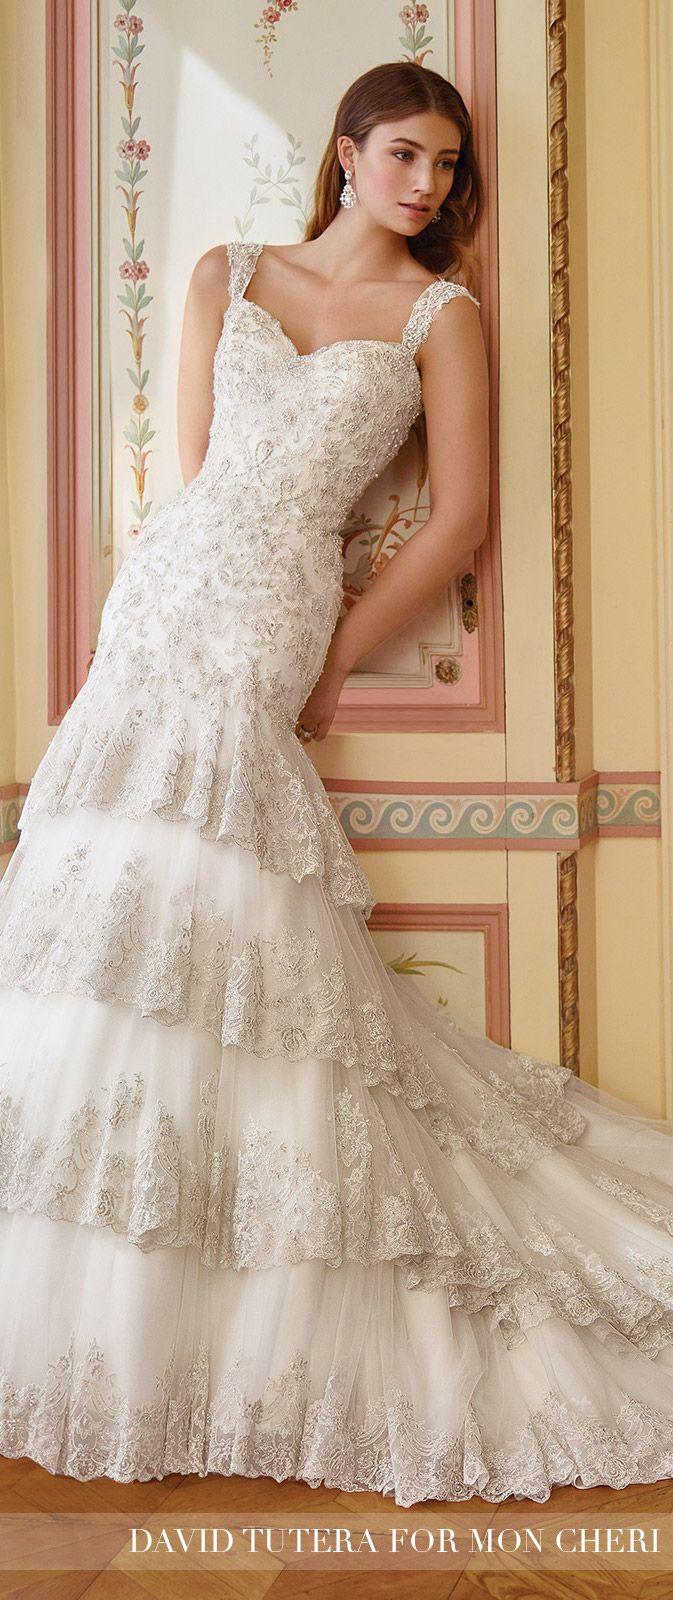 David wedding dress  Embroidered Lace Mermaid Layered Wedding Dress  Isabelline